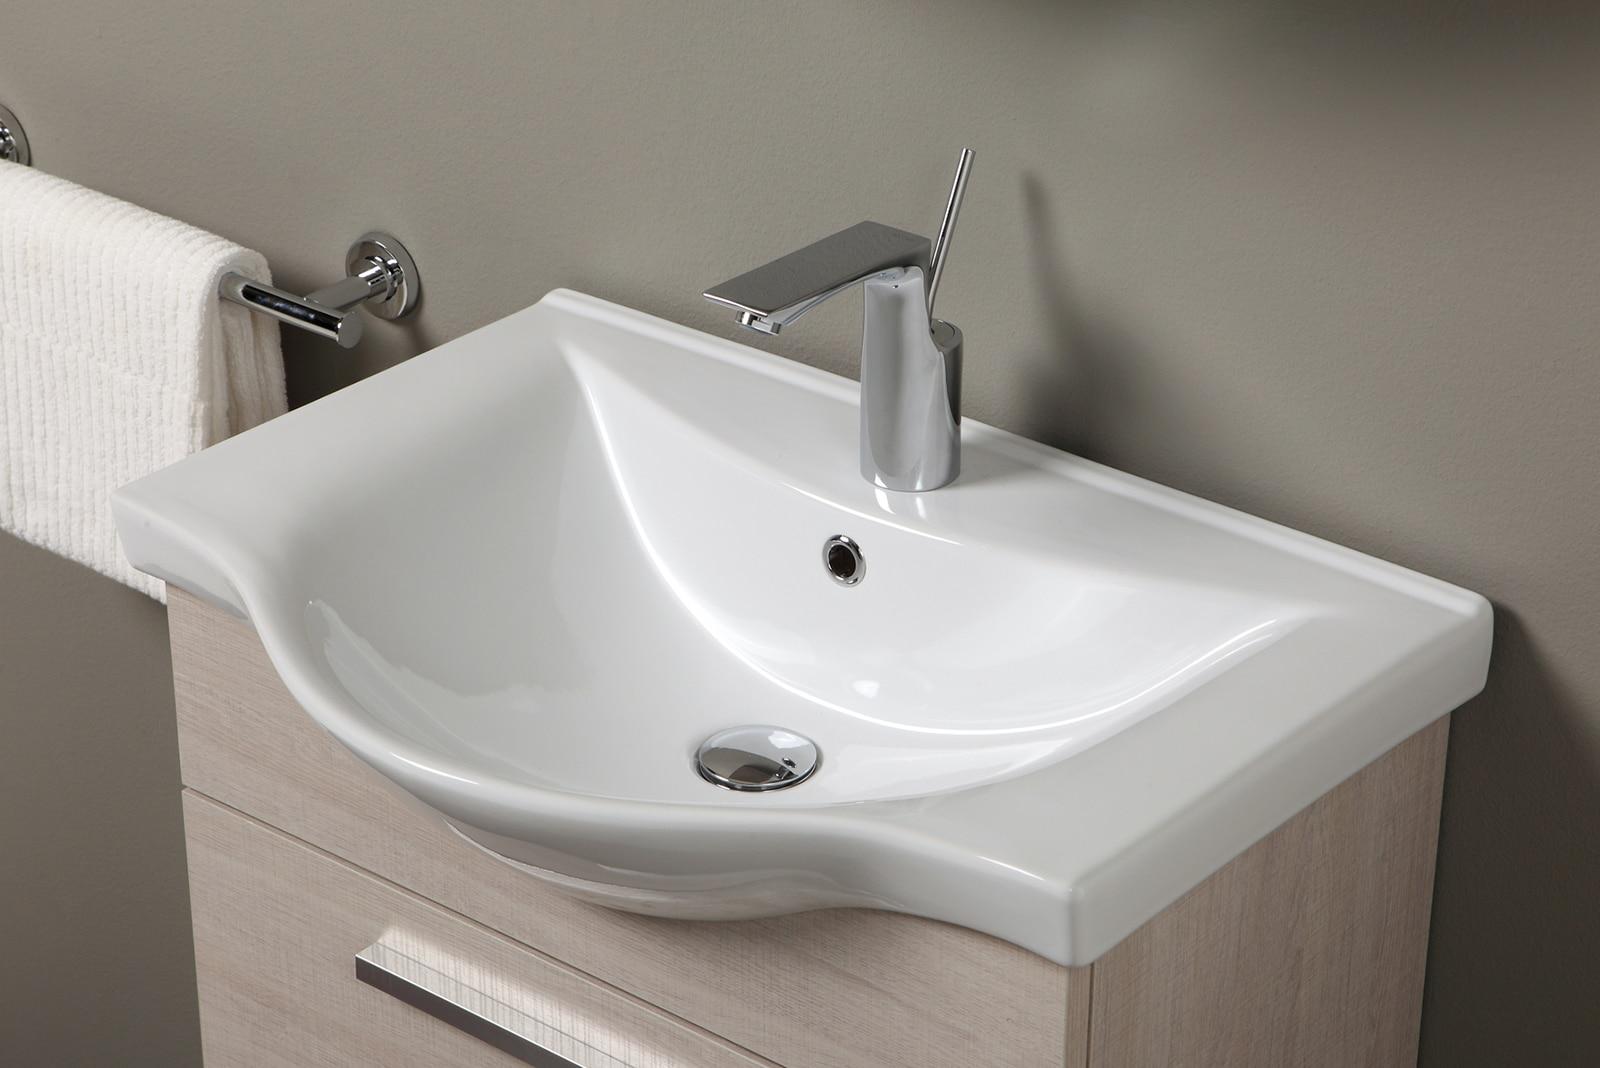 Jaquar bathroom fittings pune for Jaguar bathroom accessories